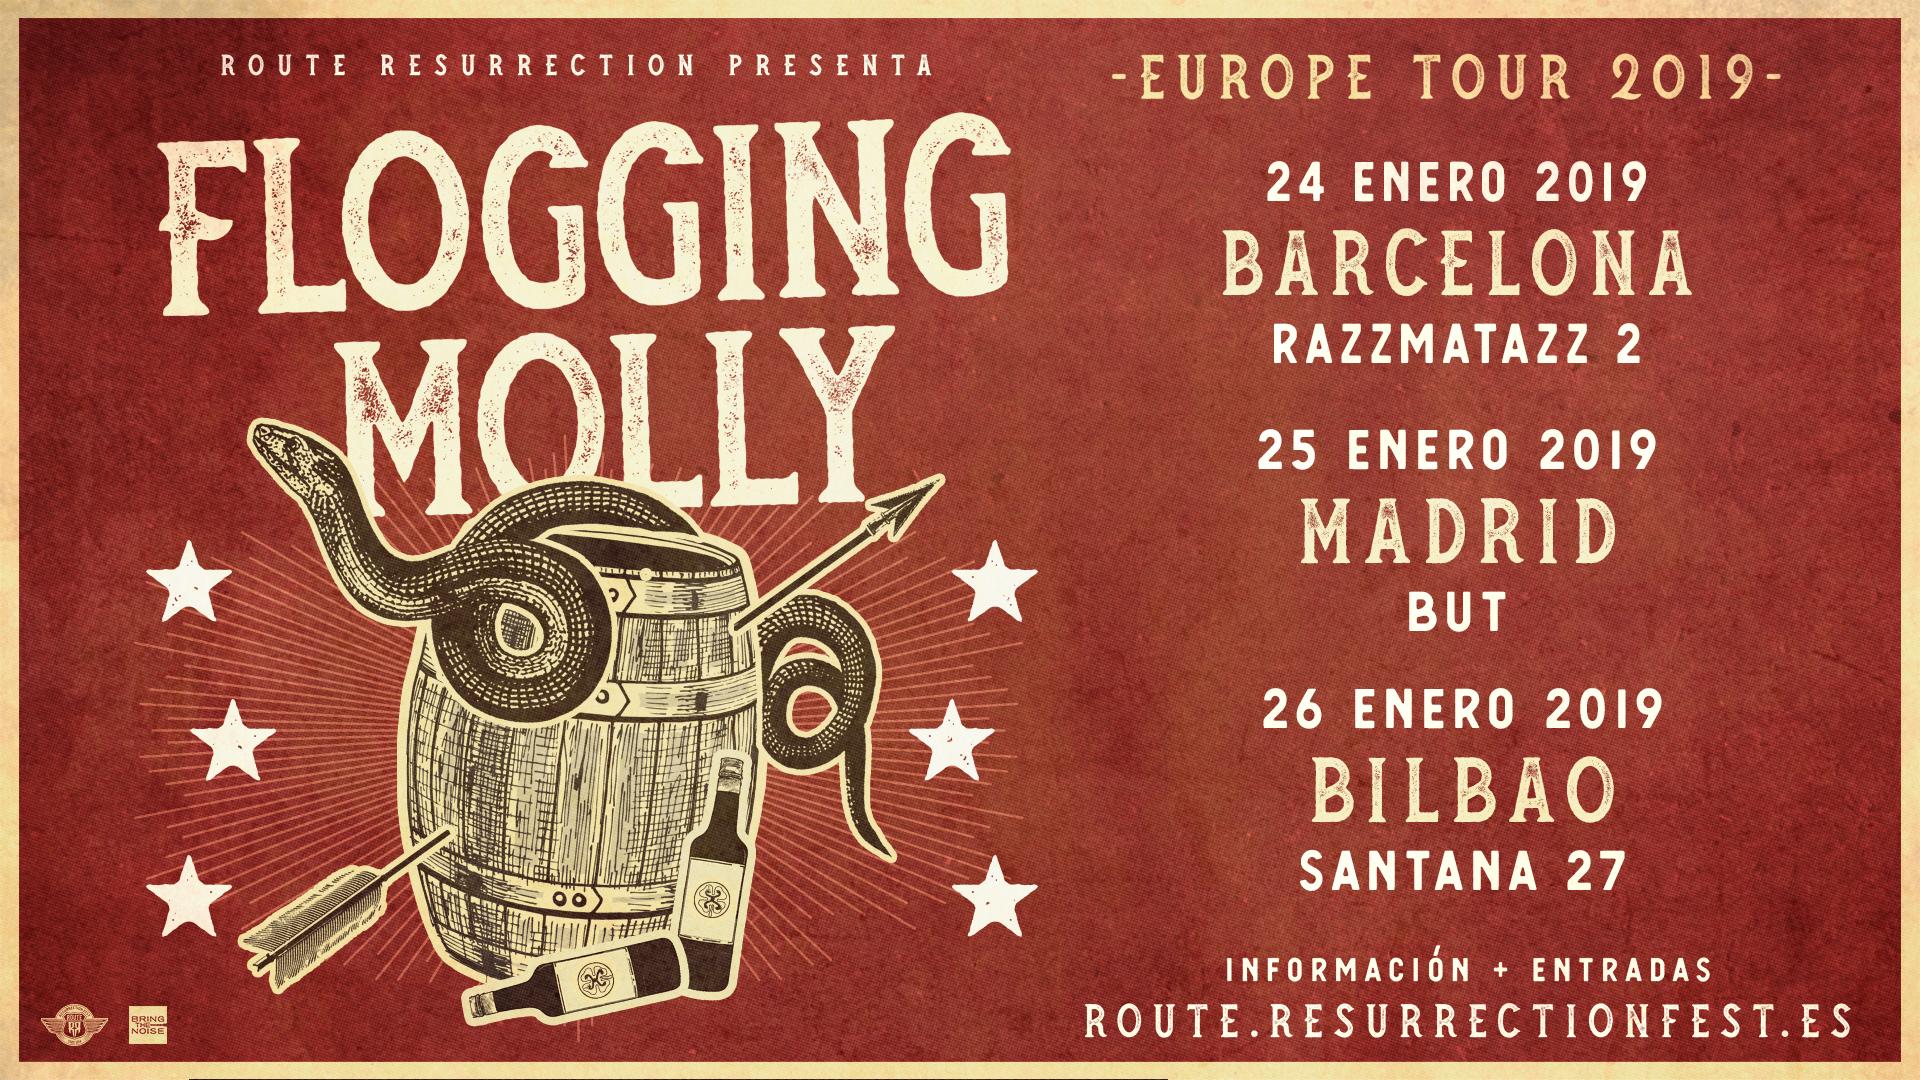 Route Resurrection Fest 2019 - Flogging Molly - Event